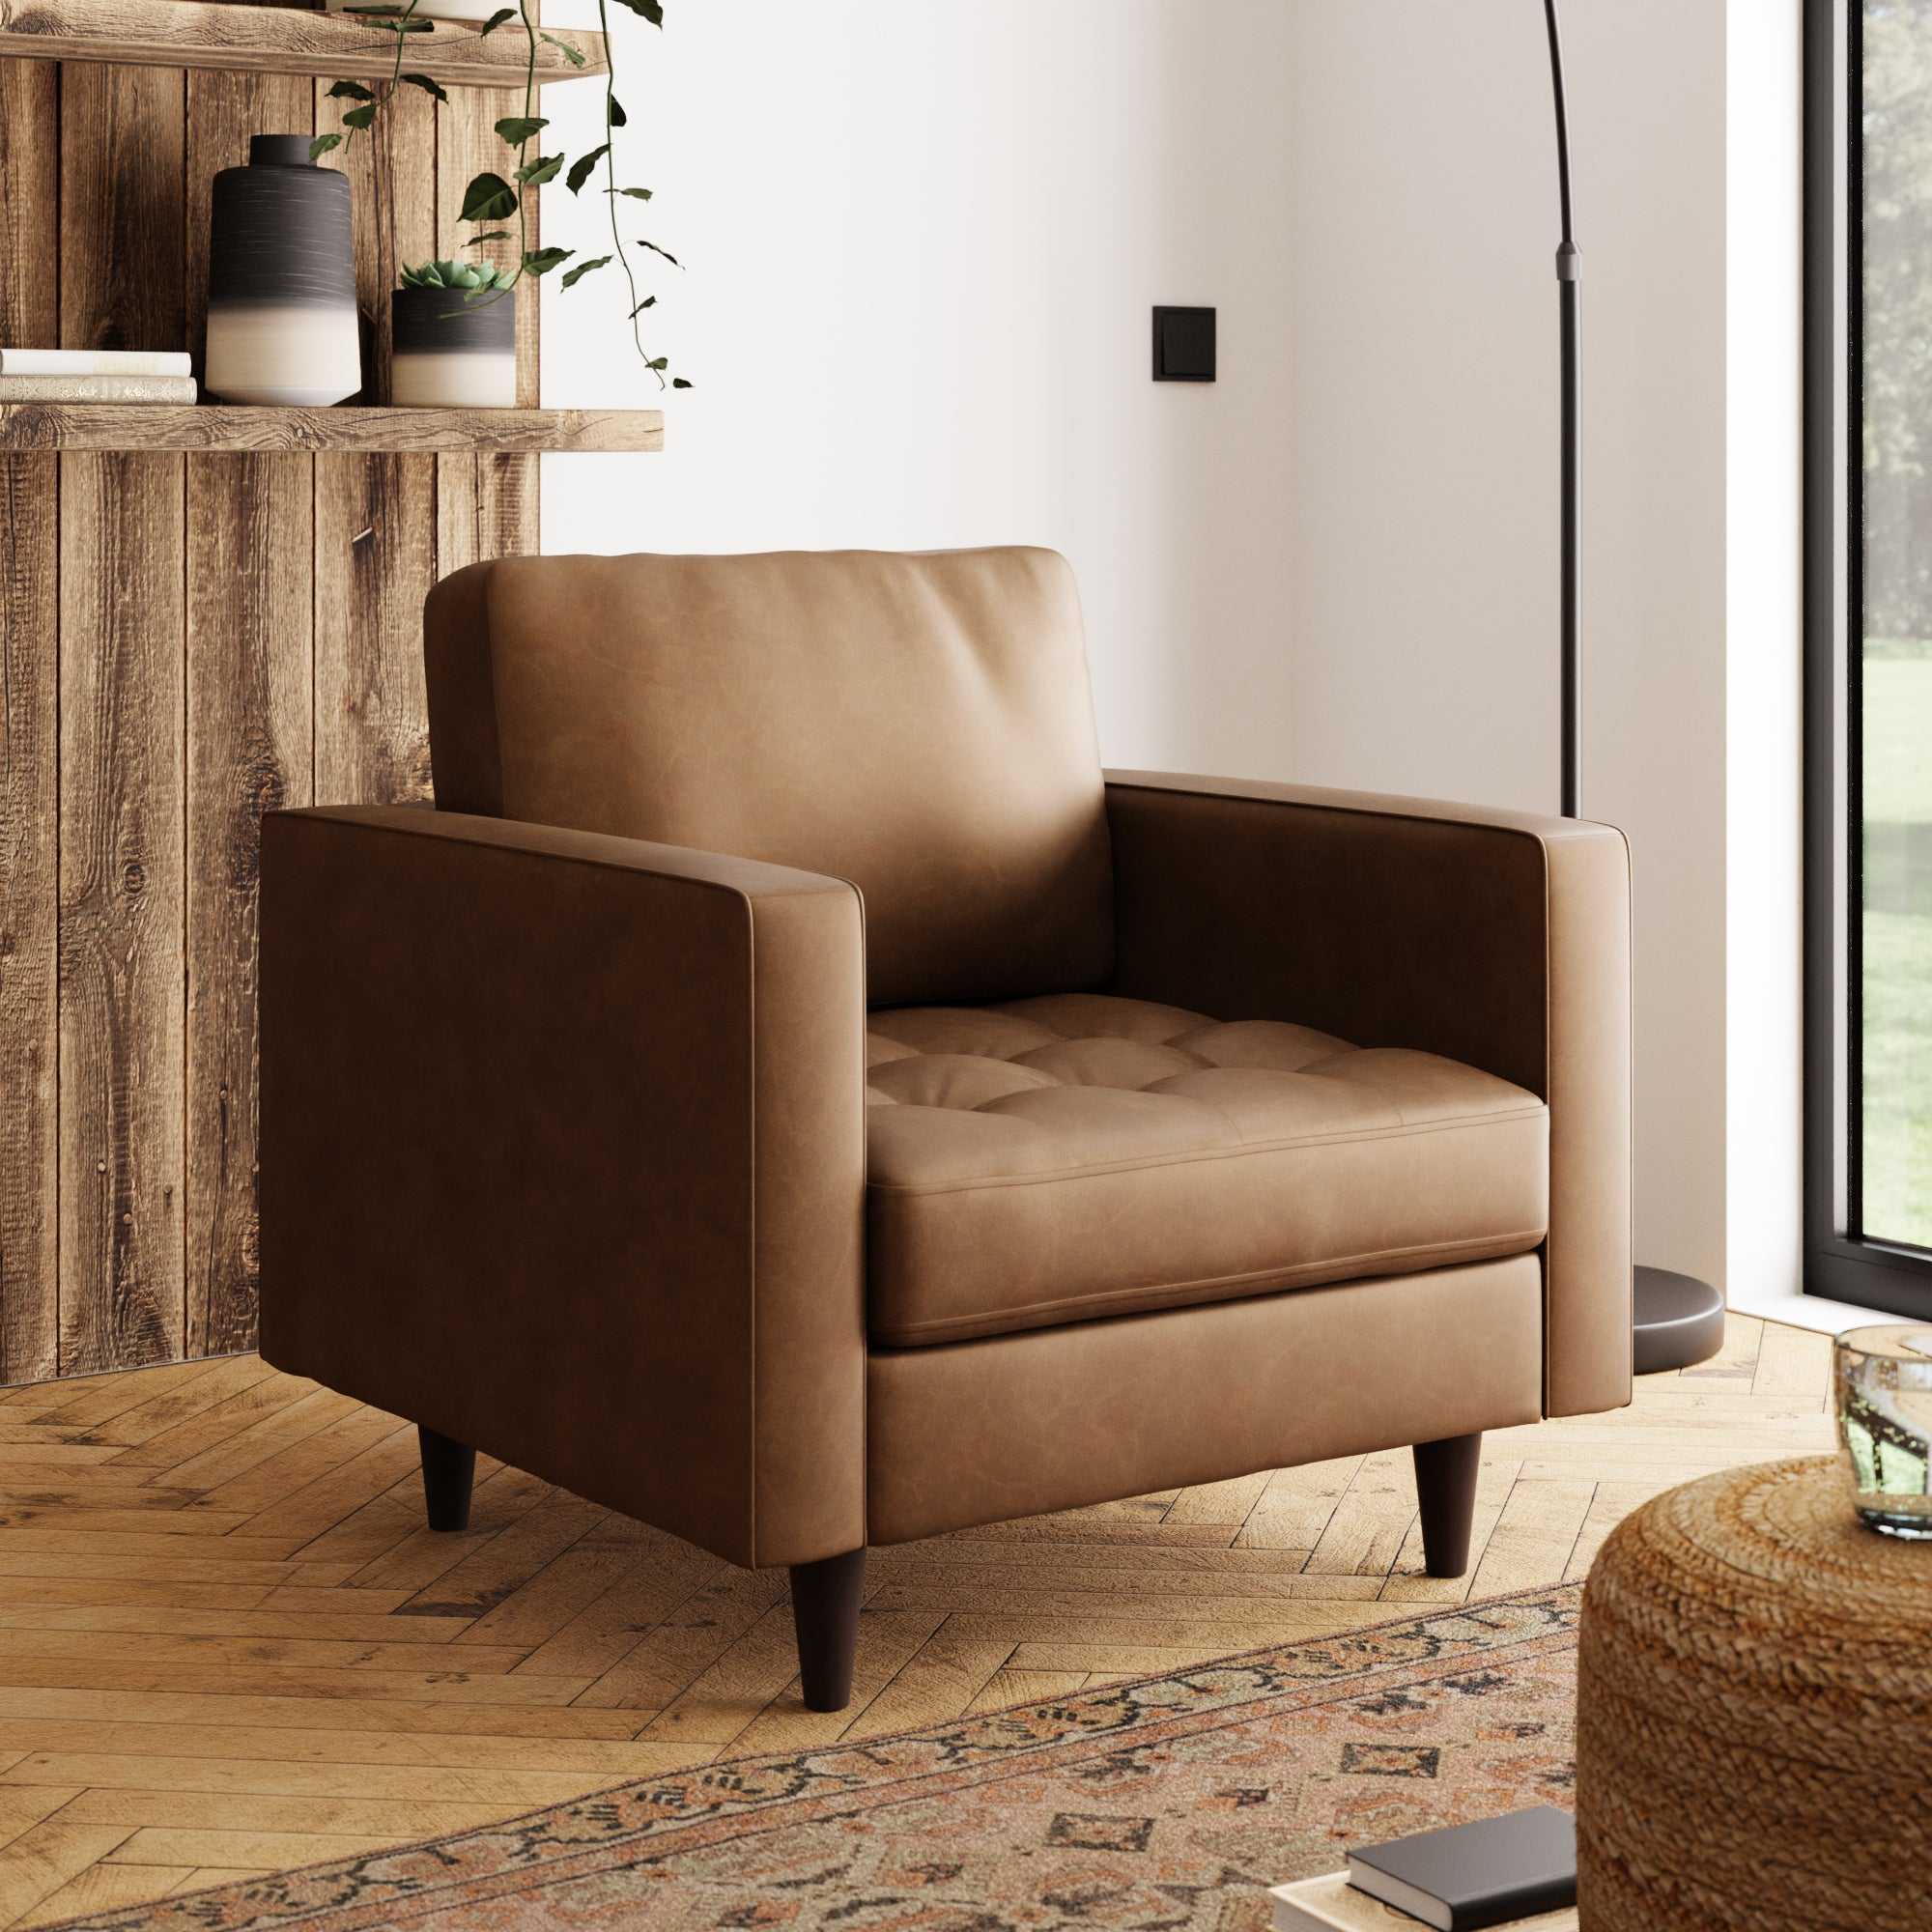 Zoe Faux Leather Armchair Tan (Brown)